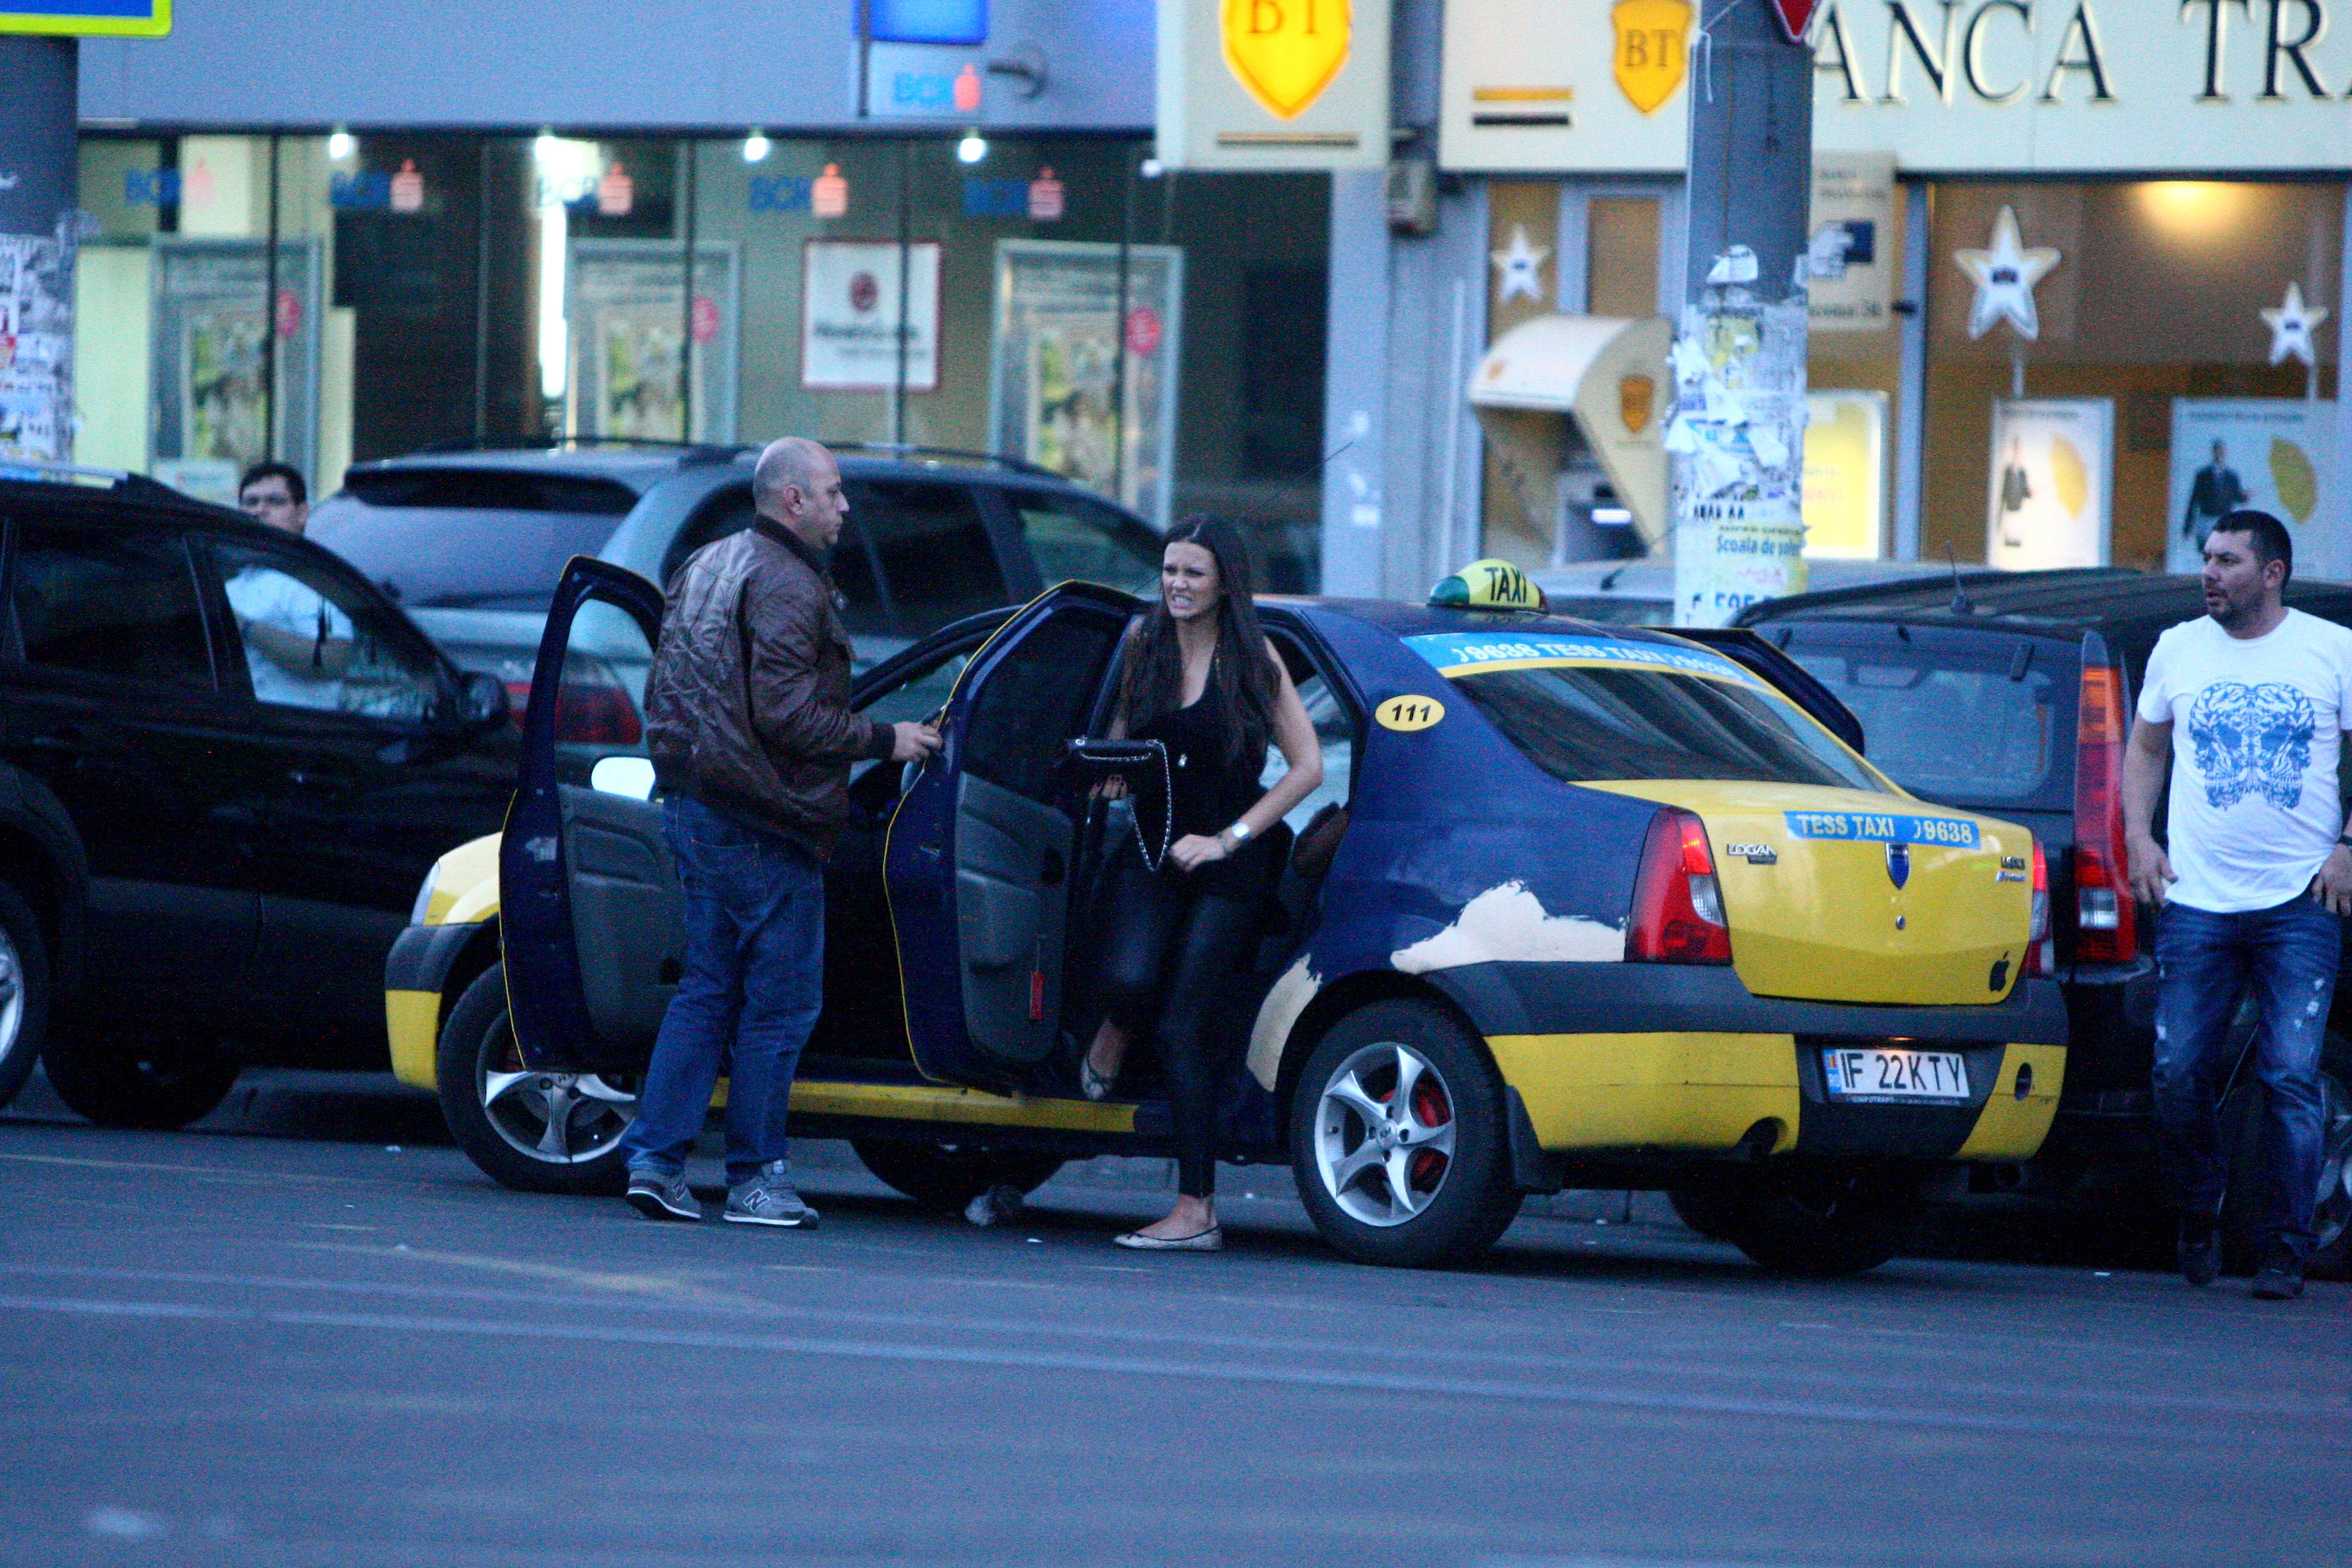 Vizibil infometata, prezentatoarea Tv coboara grabita din taxi